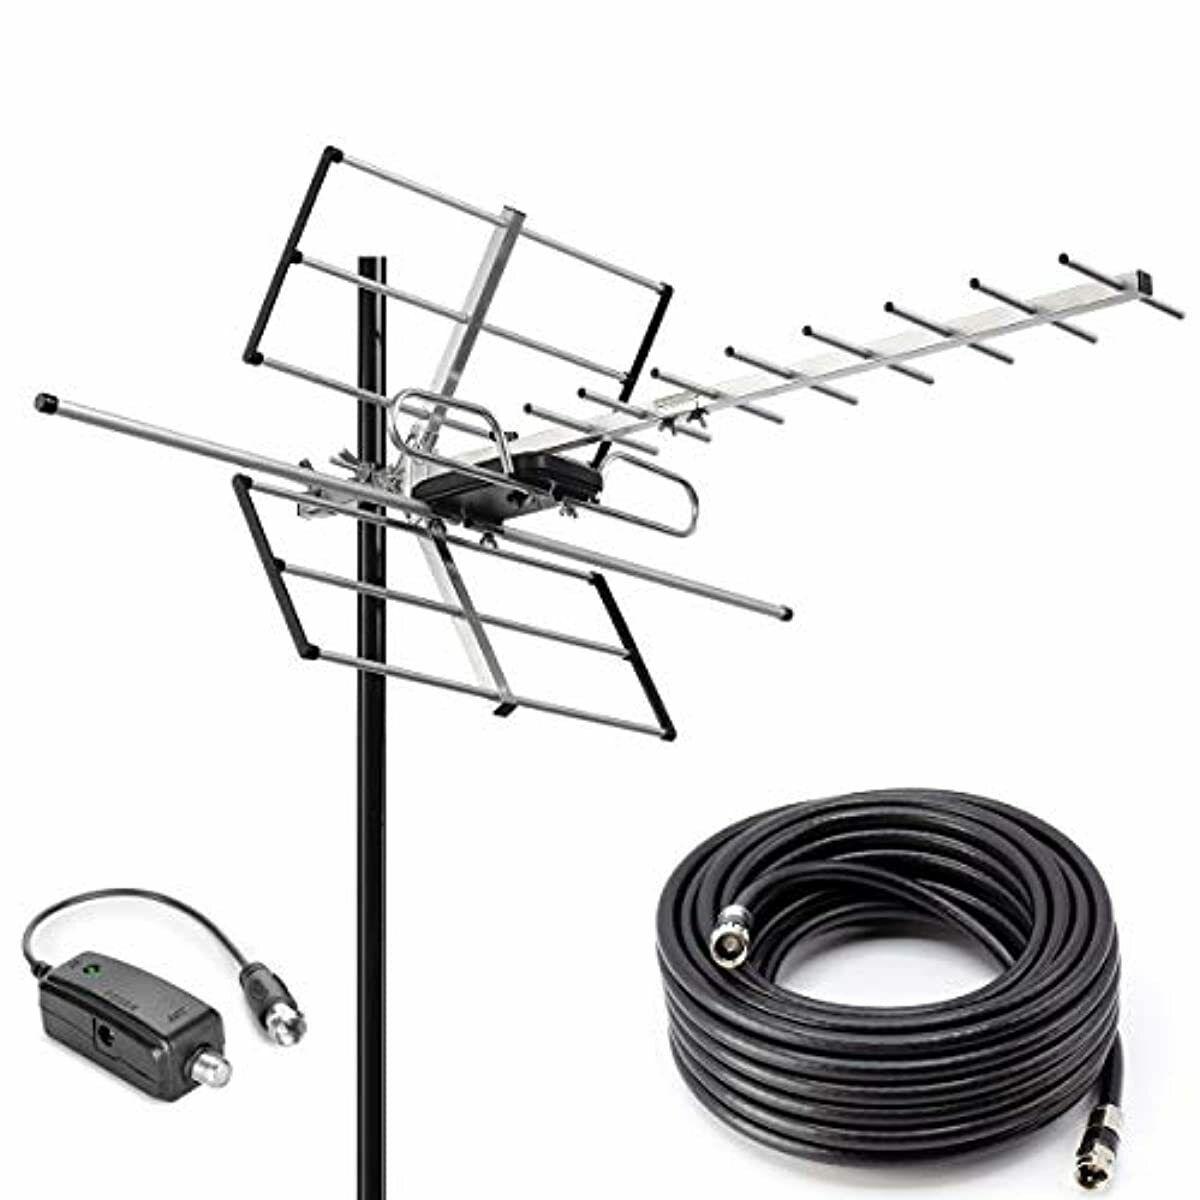 pbd outdoor digital amplified yagi hdtv antenna